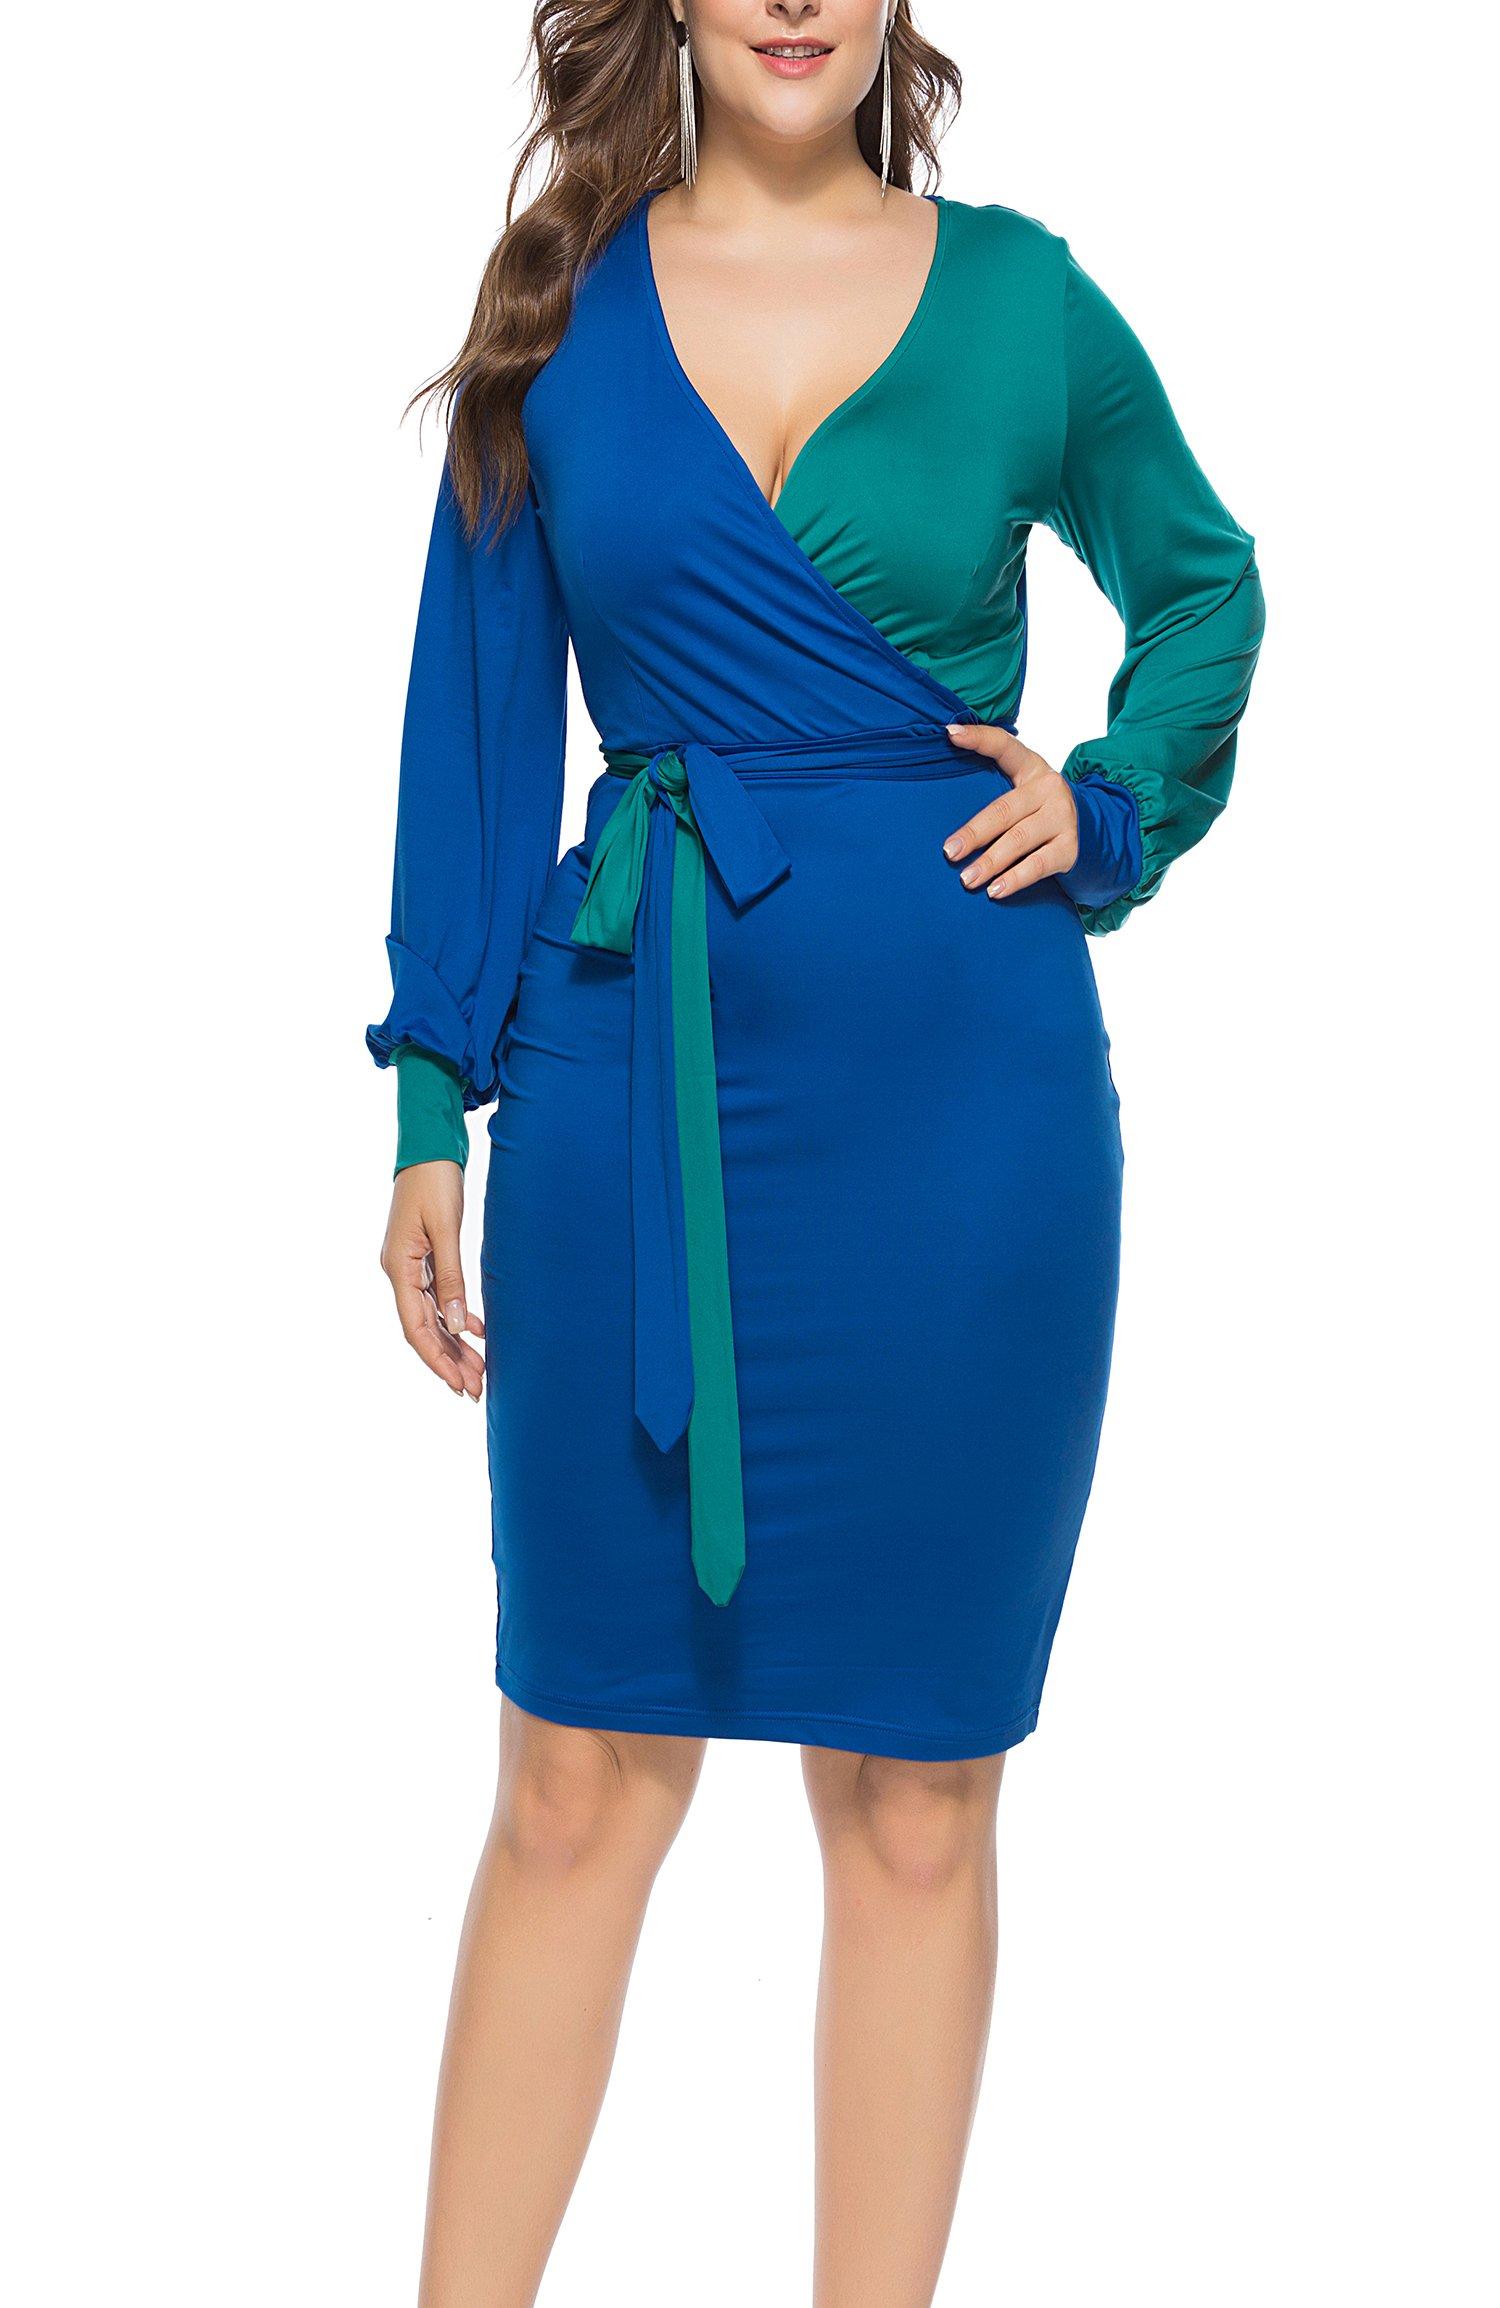 FACE N FACE Womens Sexy Deep V-Neck Midi Bodycon Dresses Long Sleeve Tie Front Colorblock Pencil Dress Mediun Blue